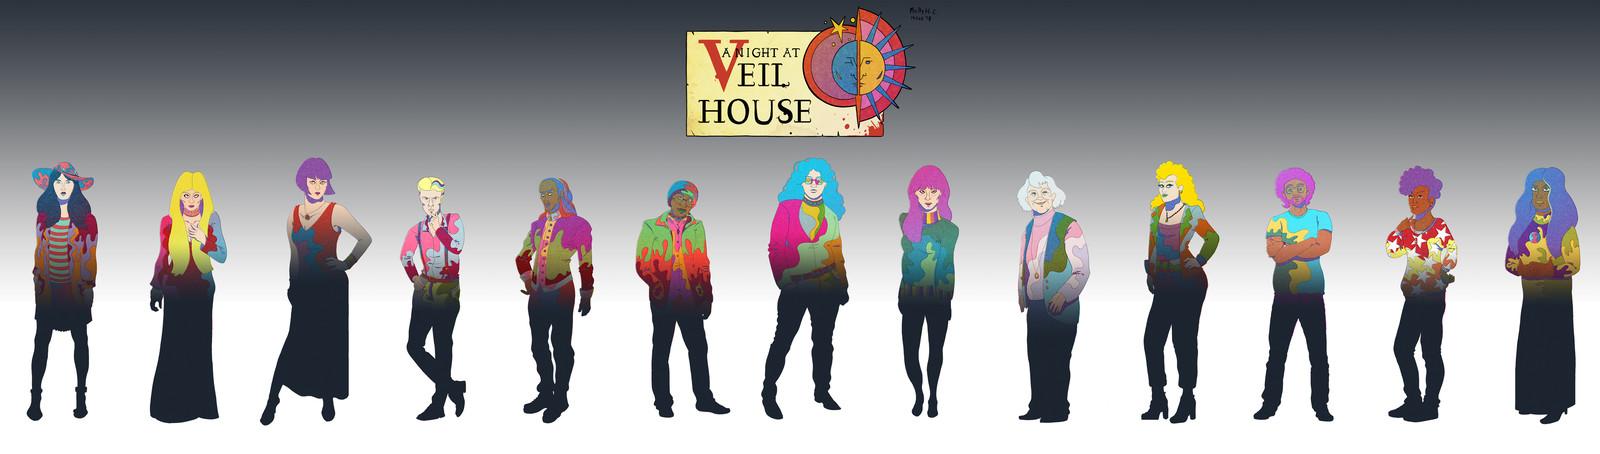 Veil House Character Portraits